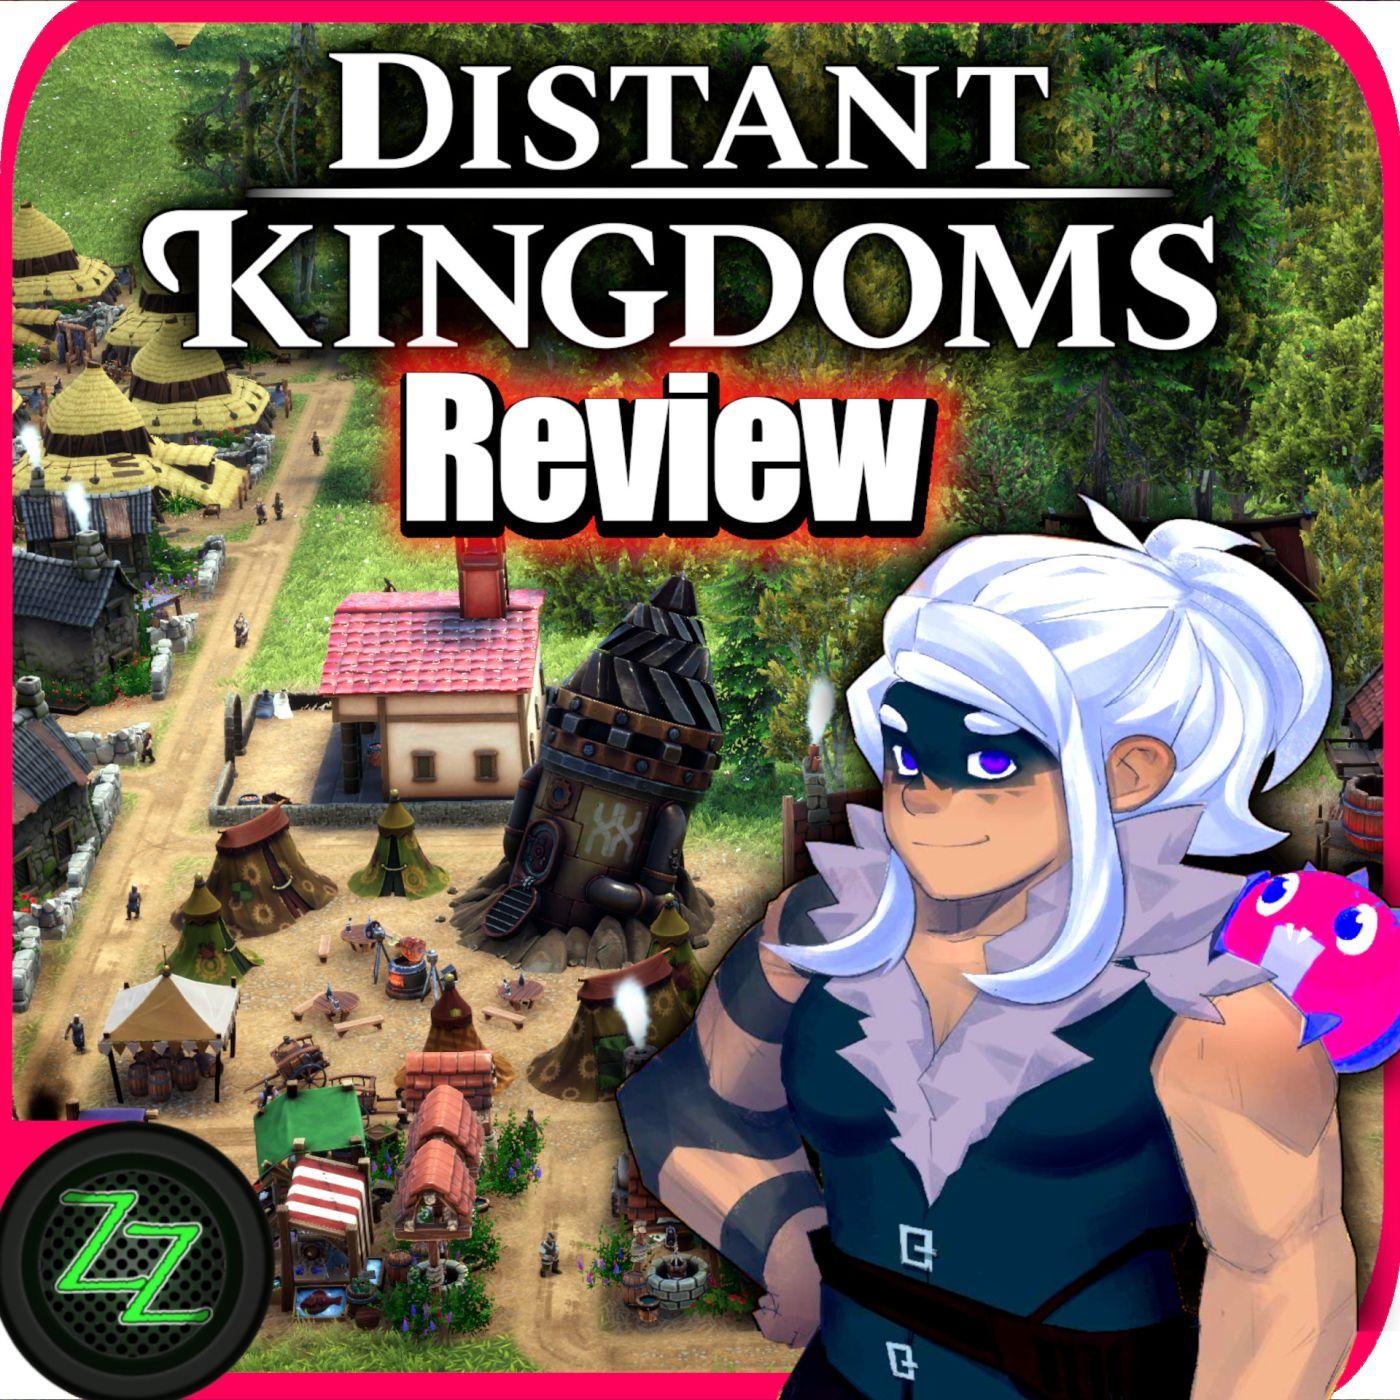 Distant Kingdoms Review – Fantasy Strategie RPG City-Builder im Test by zapzockt.de